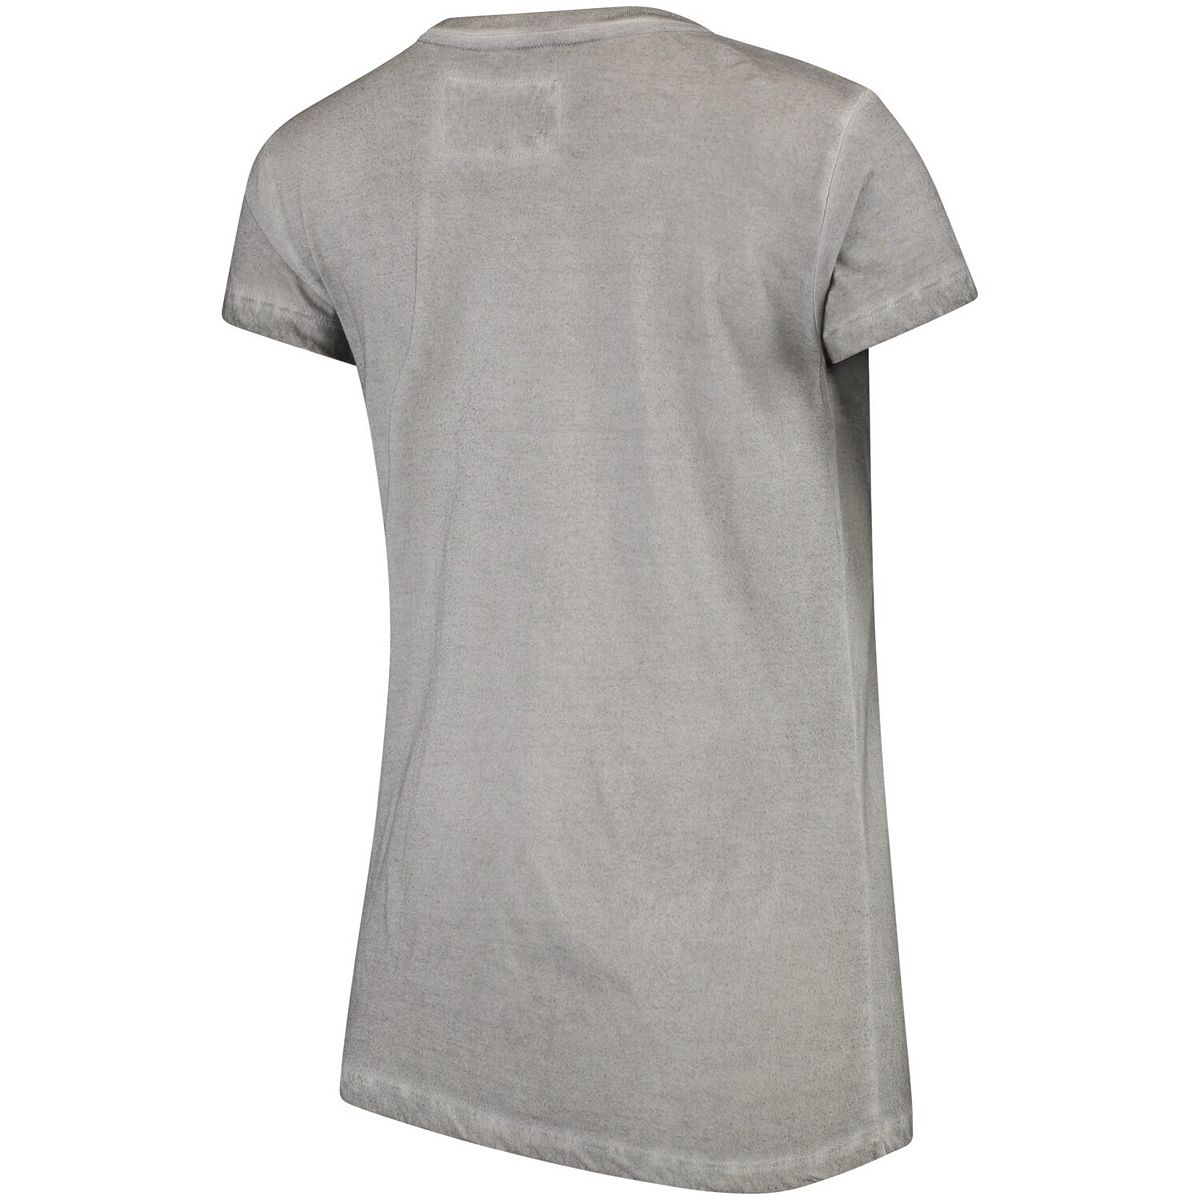 Women's Heathered Gray Florida State Seminoles Softy Vintage Overdyed Crewneck Short Sleeve T-Shirt OSf8i